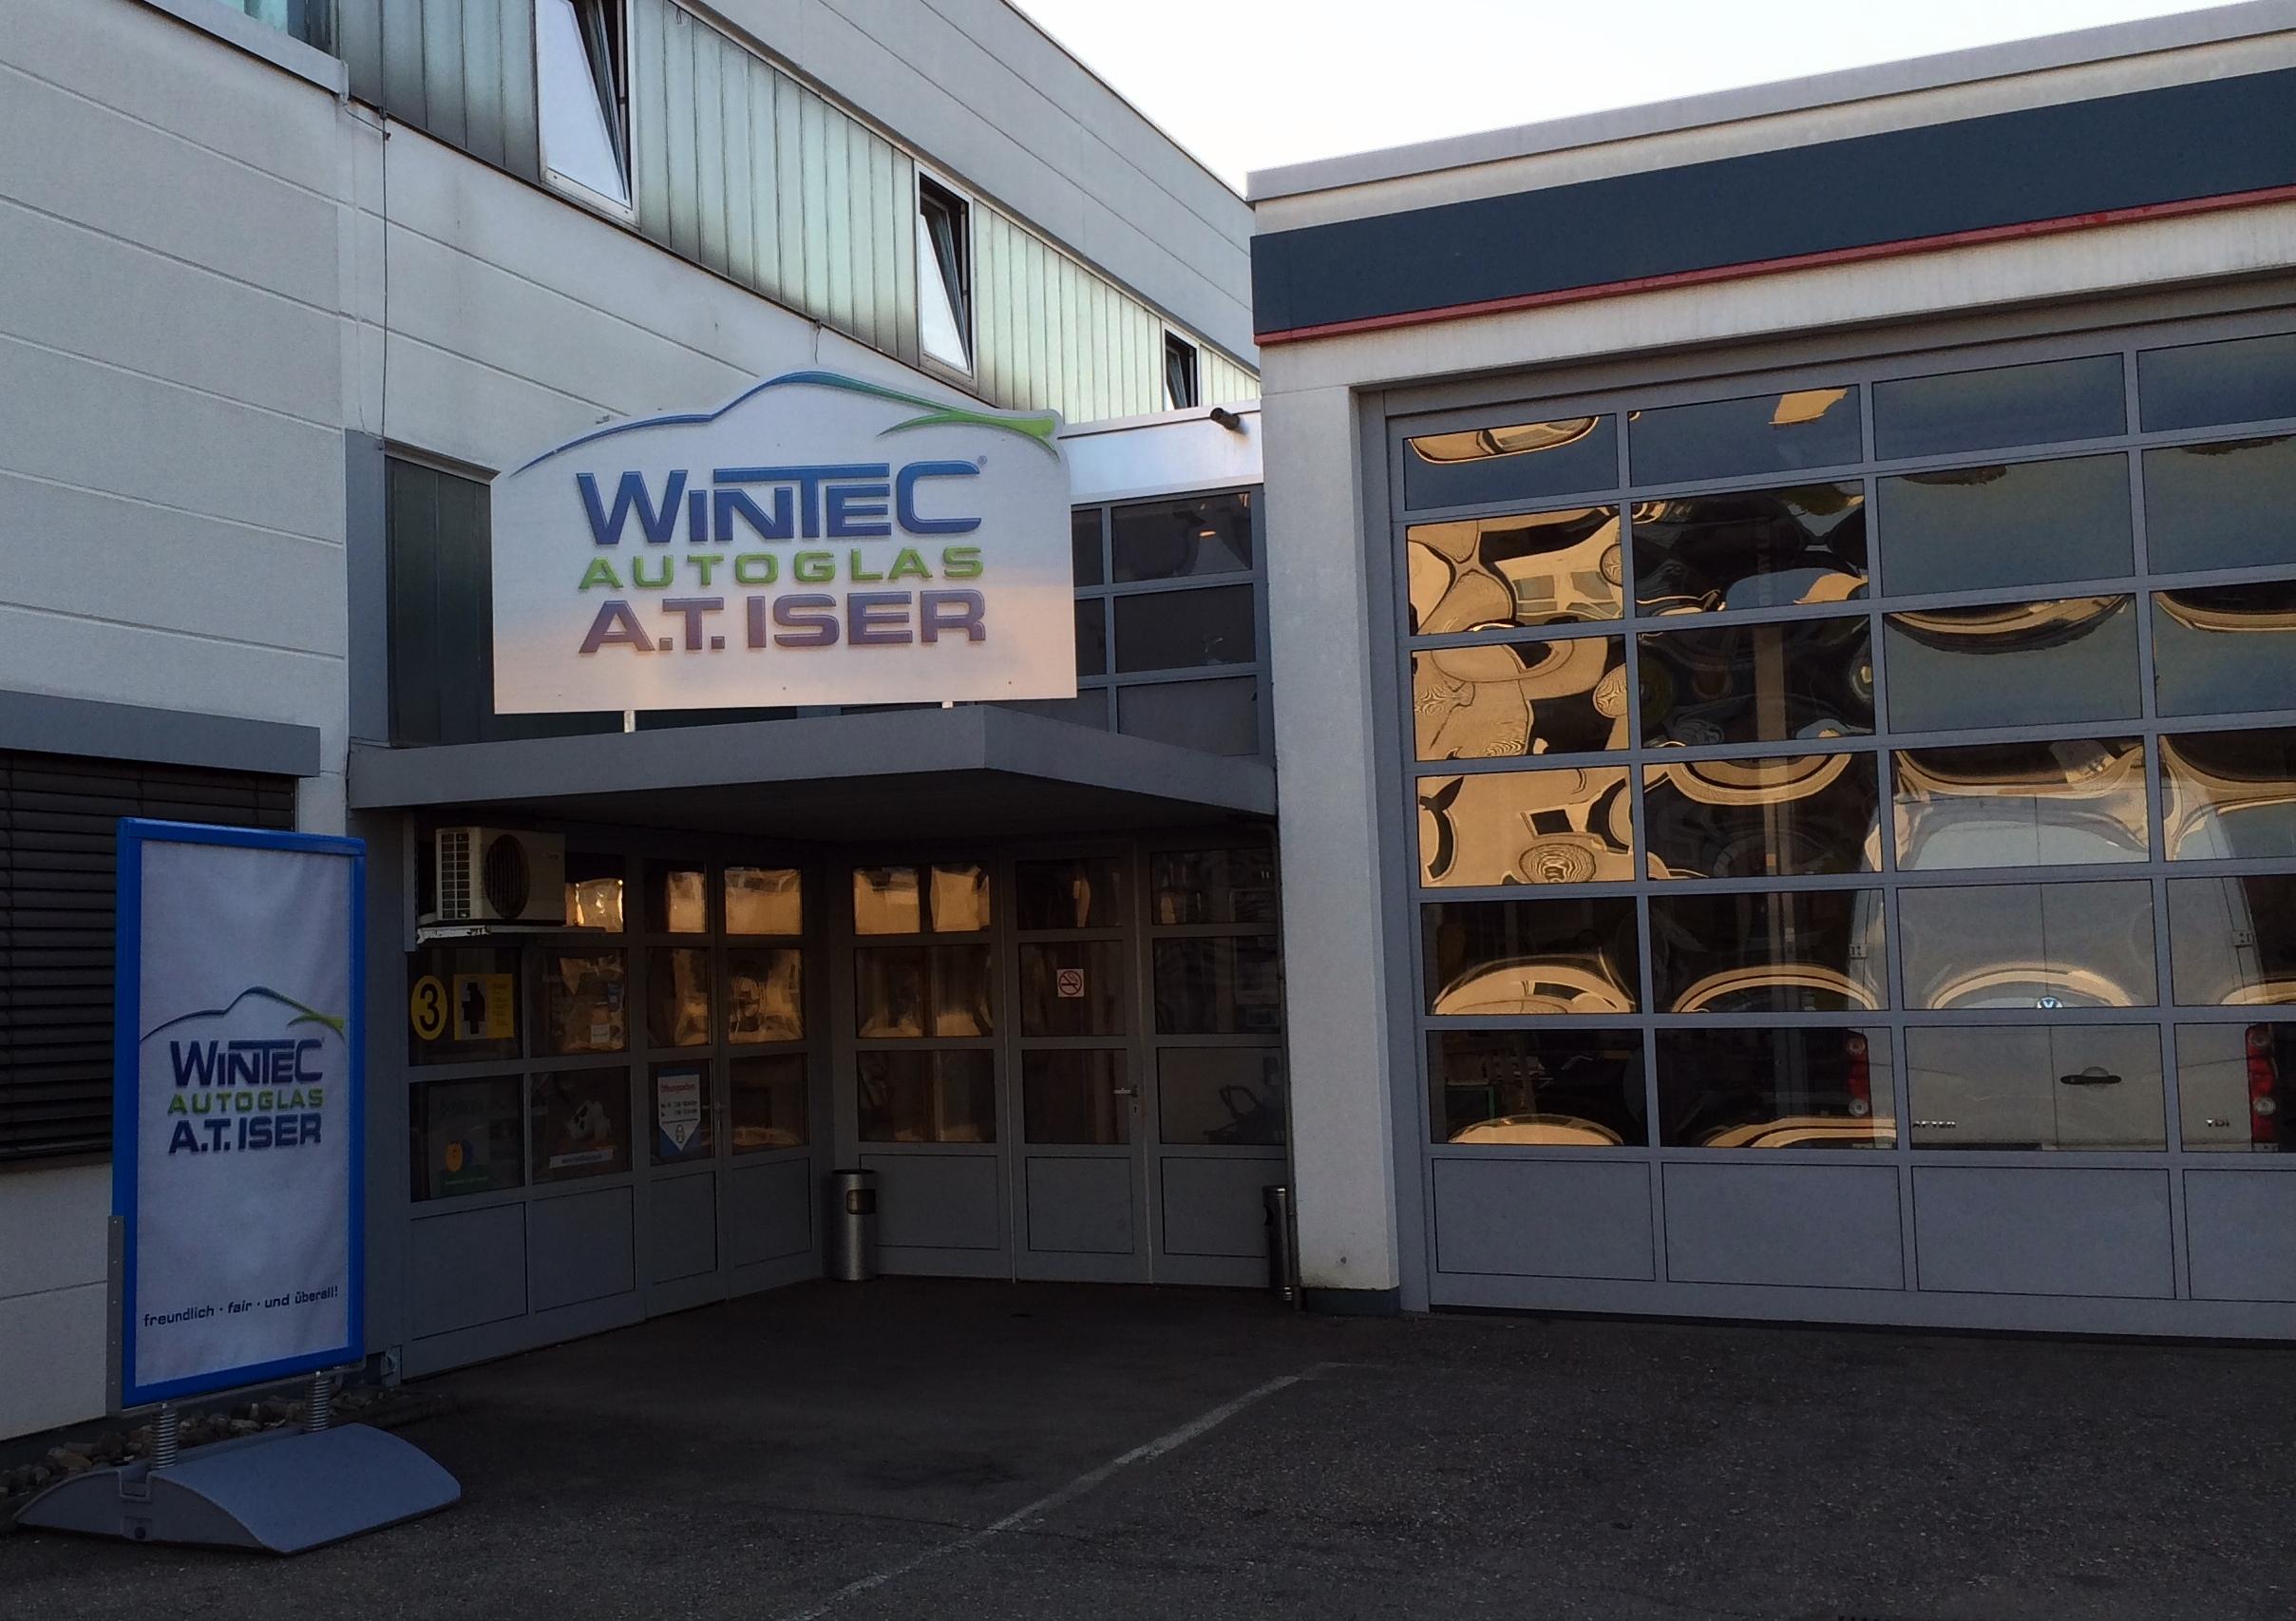 Wintec Autoglas A.T. Iser - Pfullingen